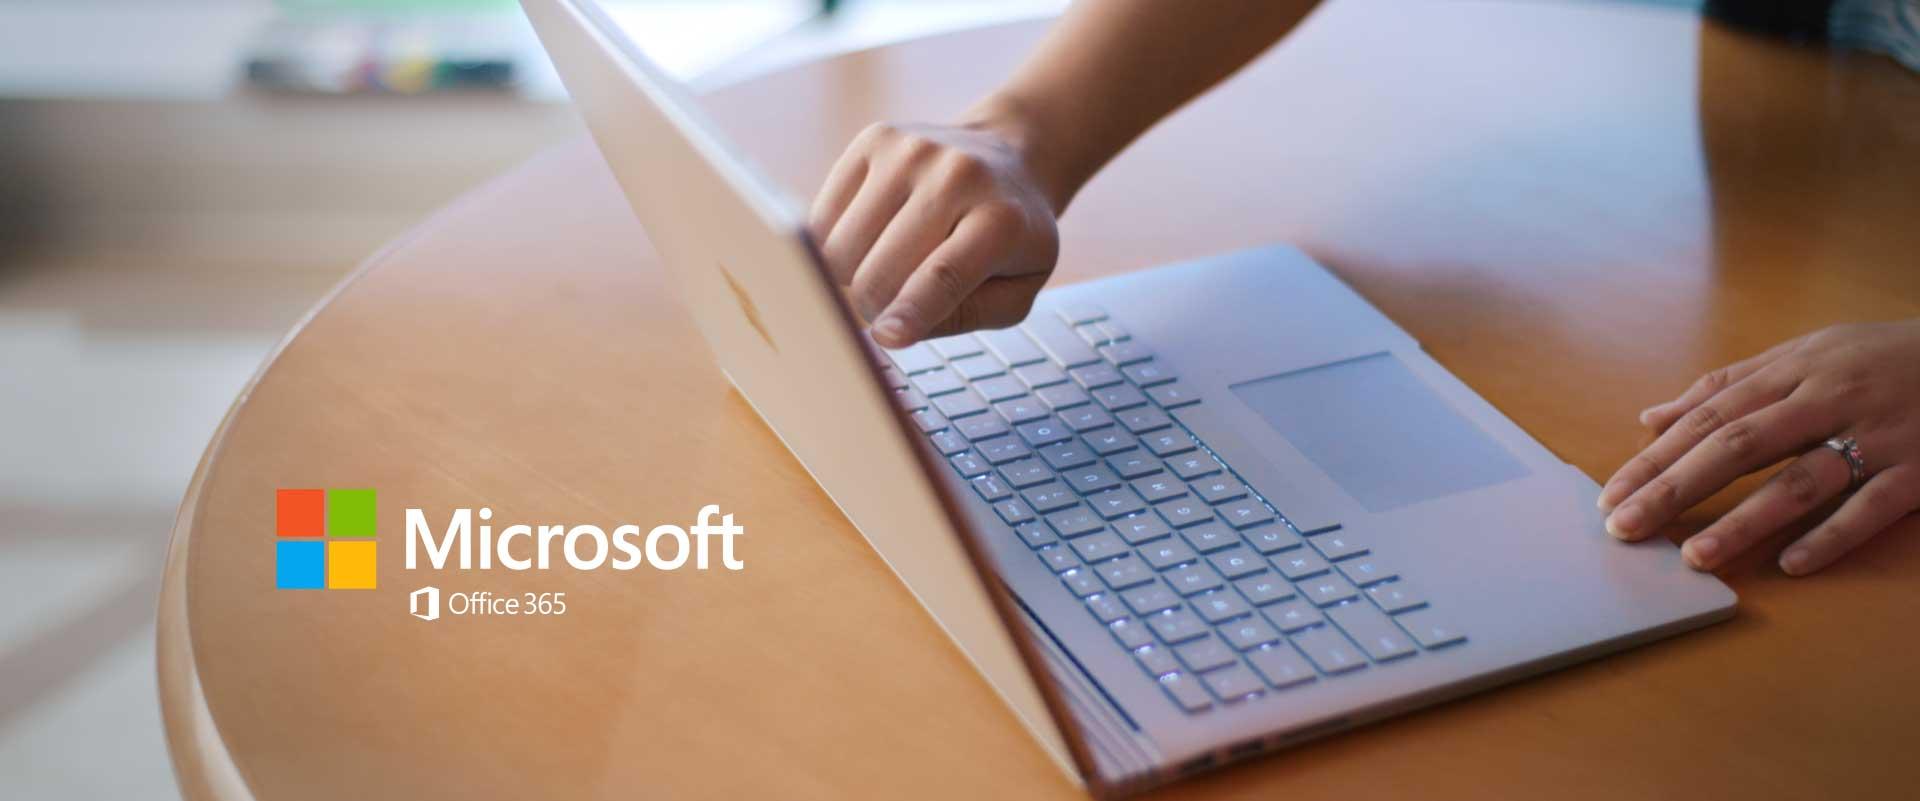 Microsoft yammer.jpg